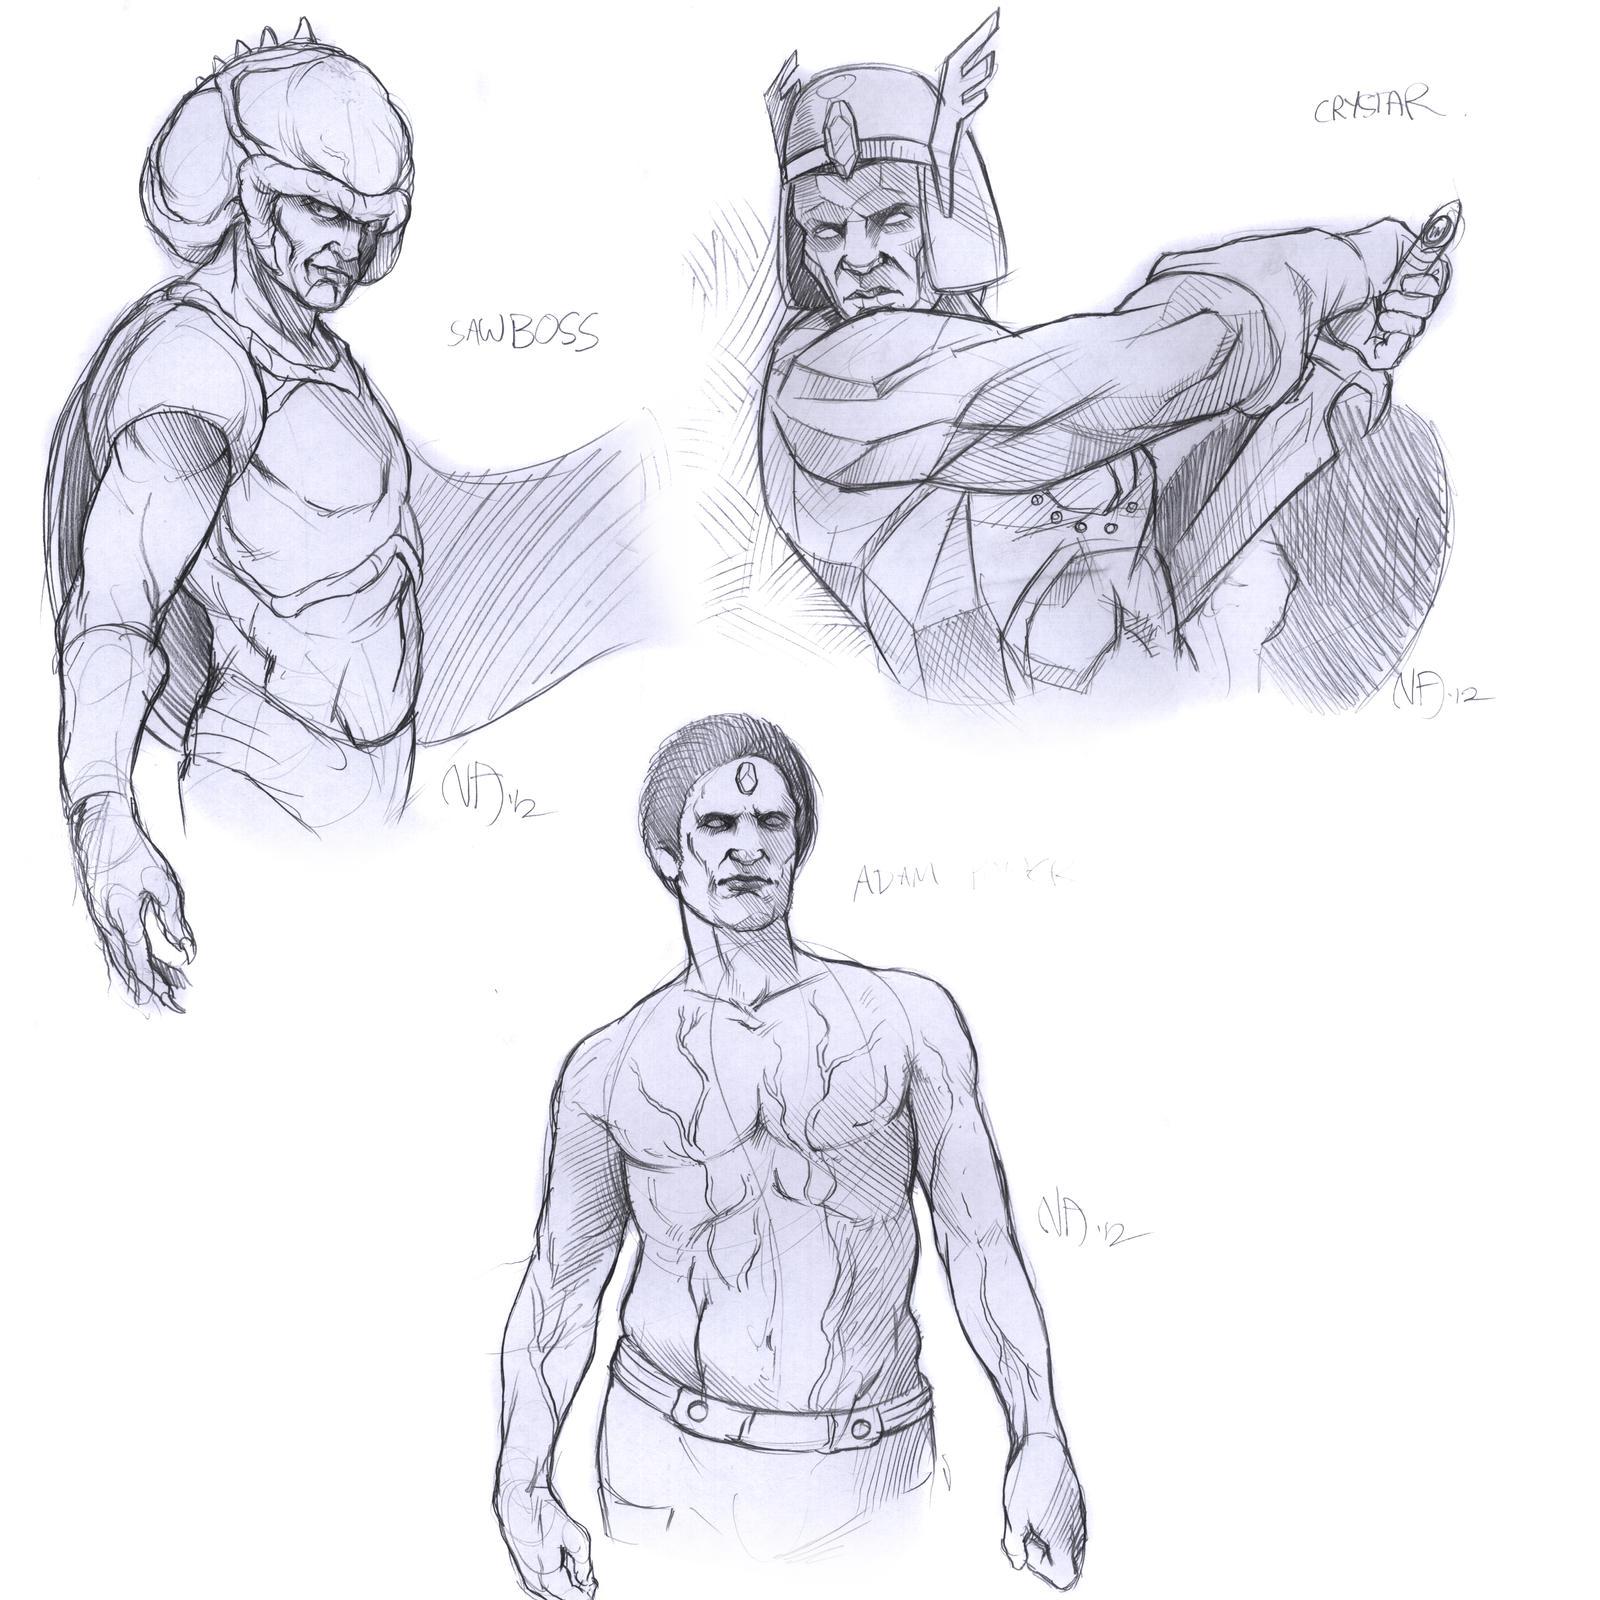 Dannycruz4 Prize sketches by Deimos-Remus